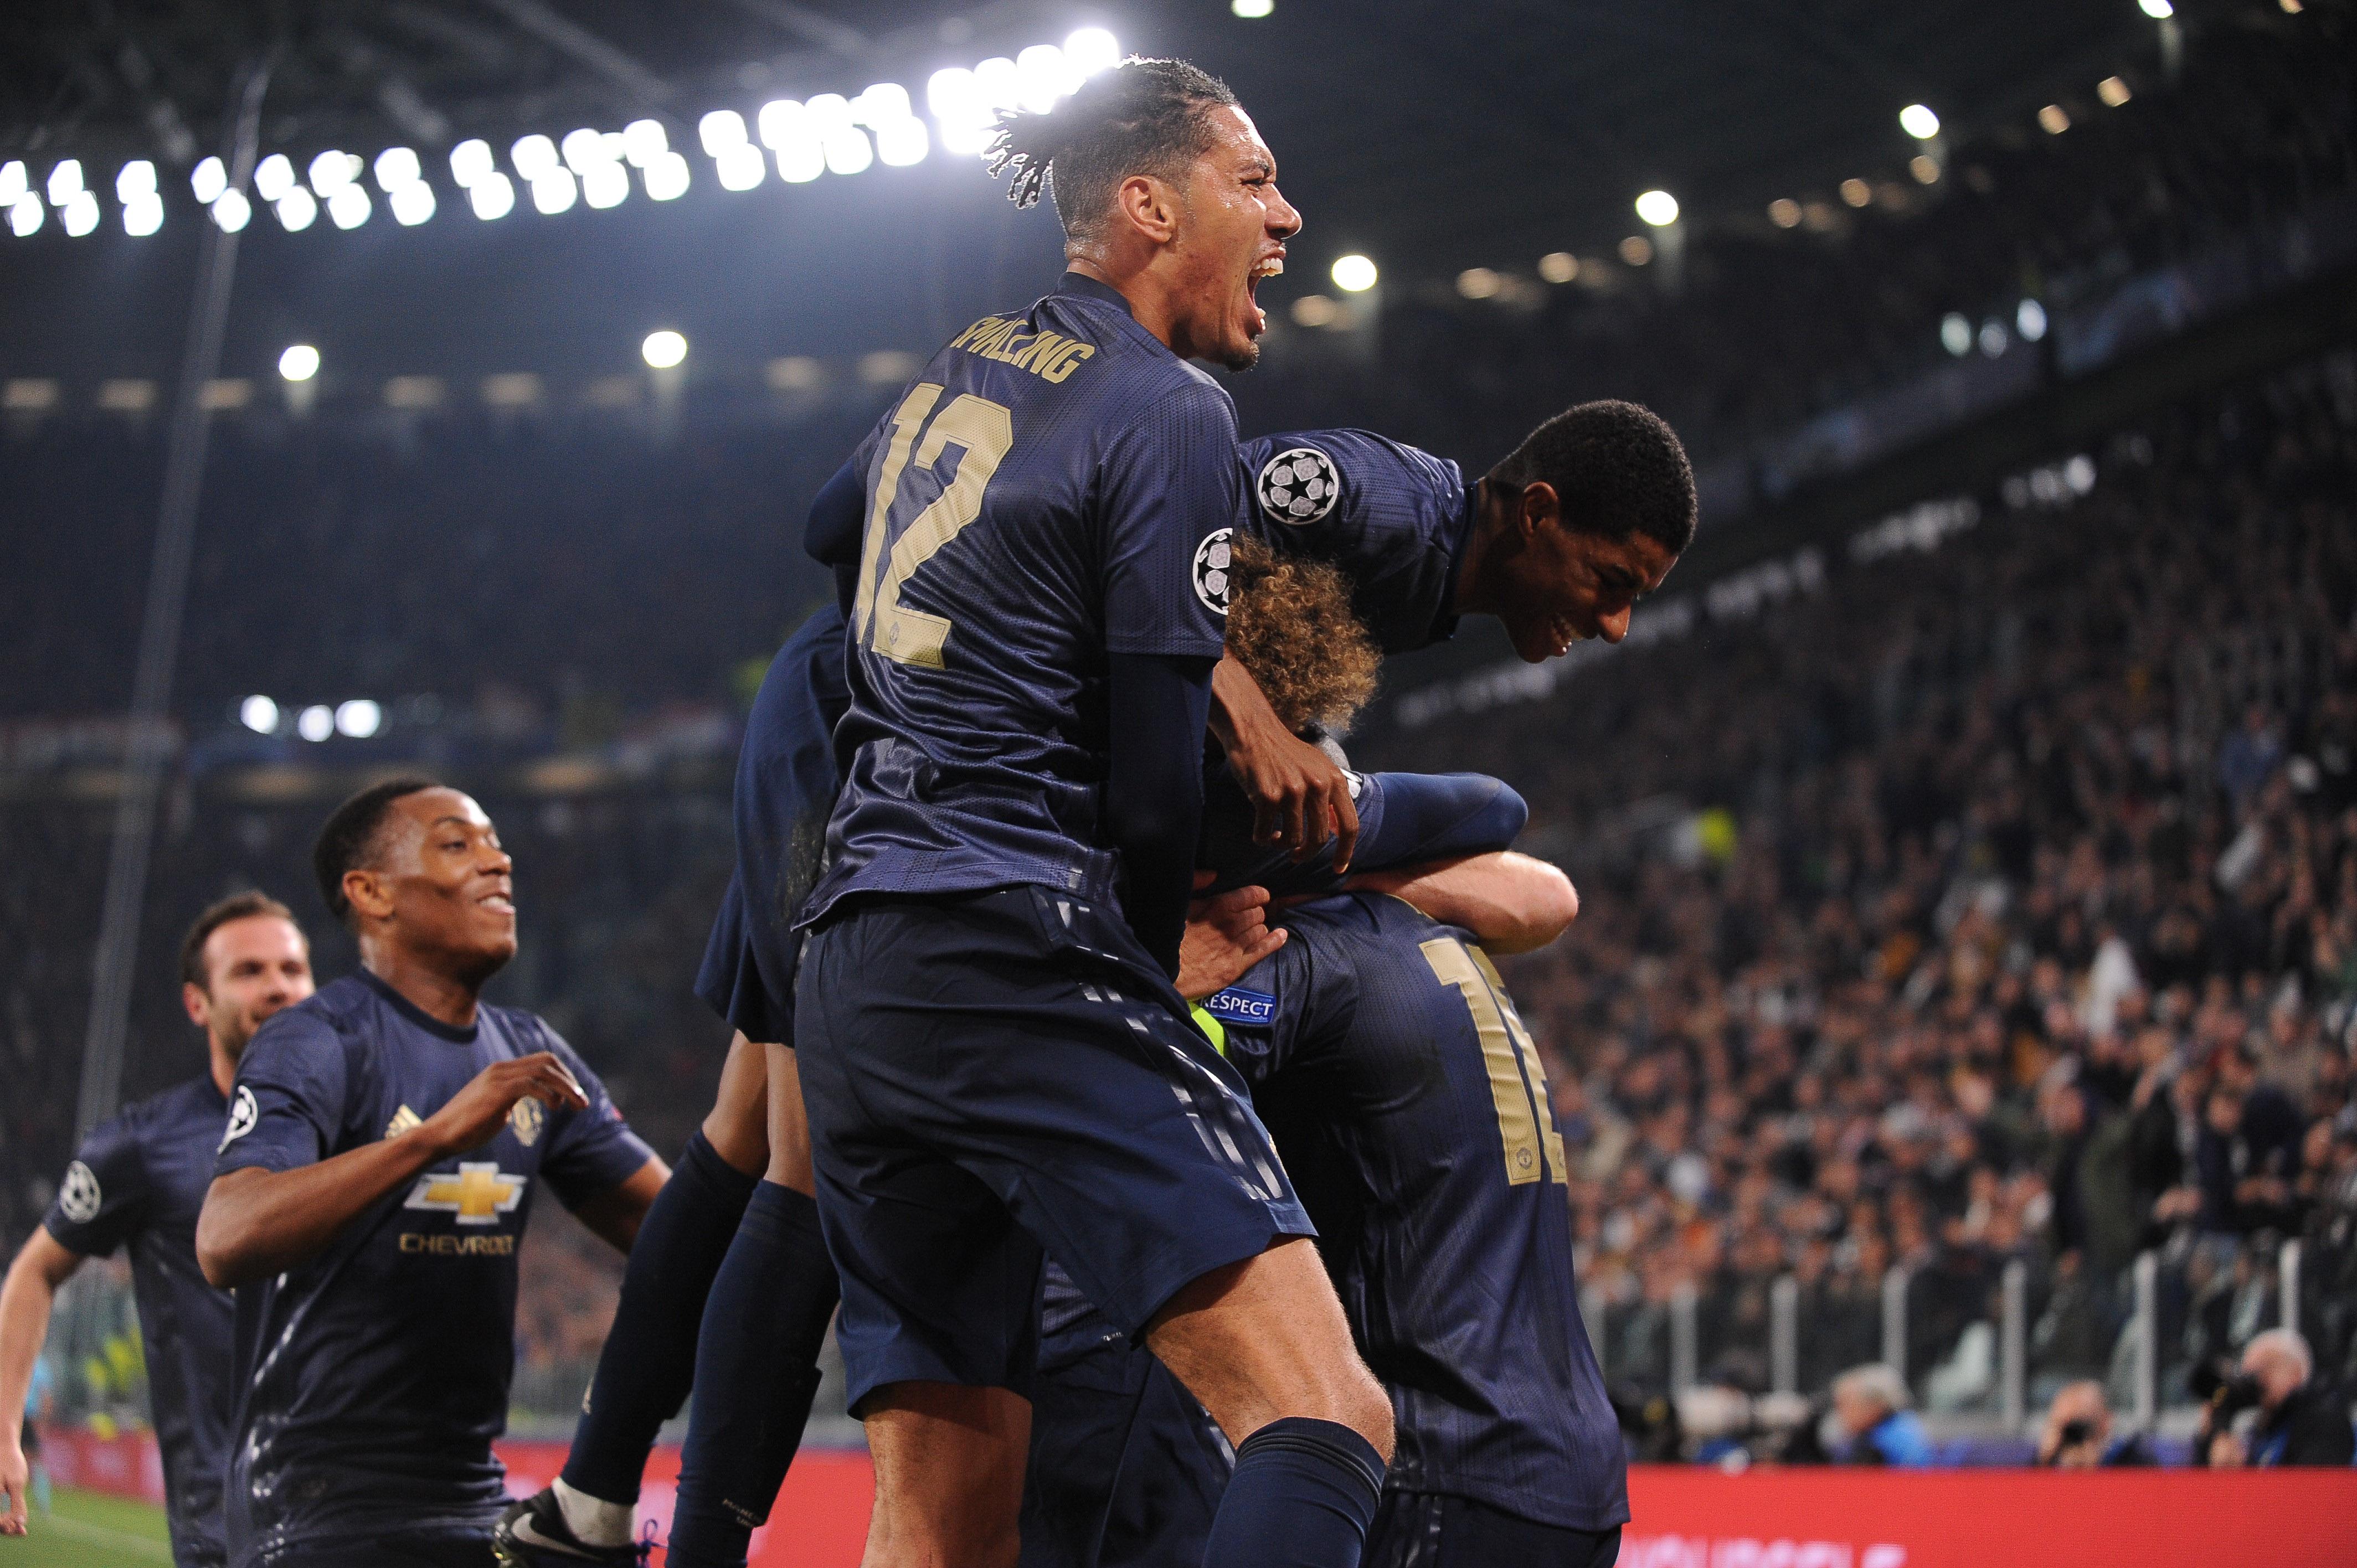 07.11.2018, Turyn, Liga Mistrzow 2018/2019, Juventus Turyn - Manchester United N/z: radosc pilkarzy Manchesteru United, Foto Norbert Barczyk / PressFocus